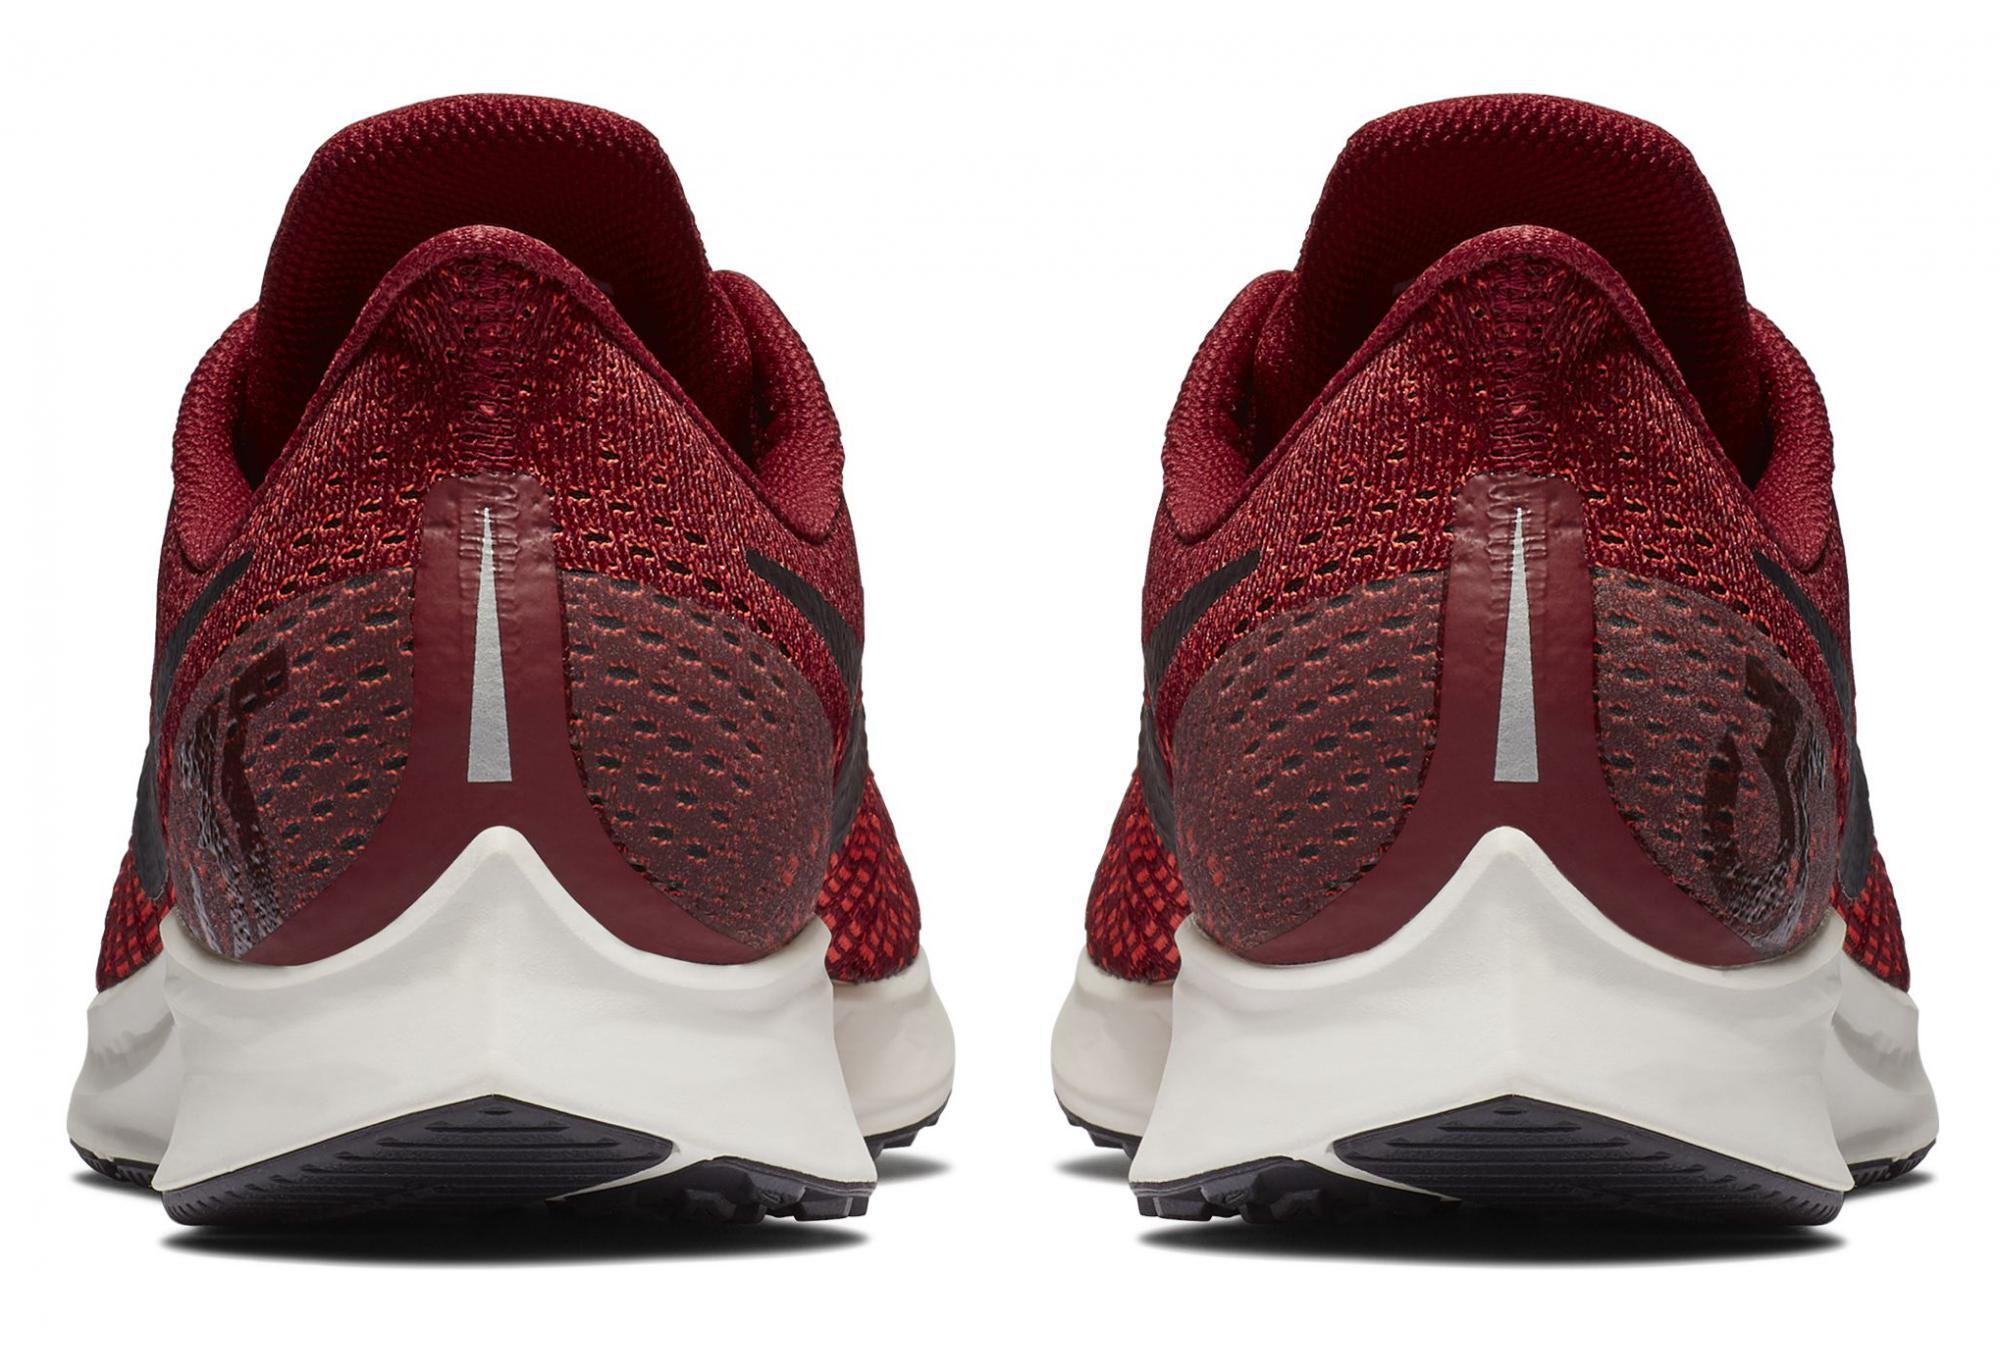 online retailer f1784 8fb7f Chaussures de Running Nike Air Zoom Pegasus 35 Rouge